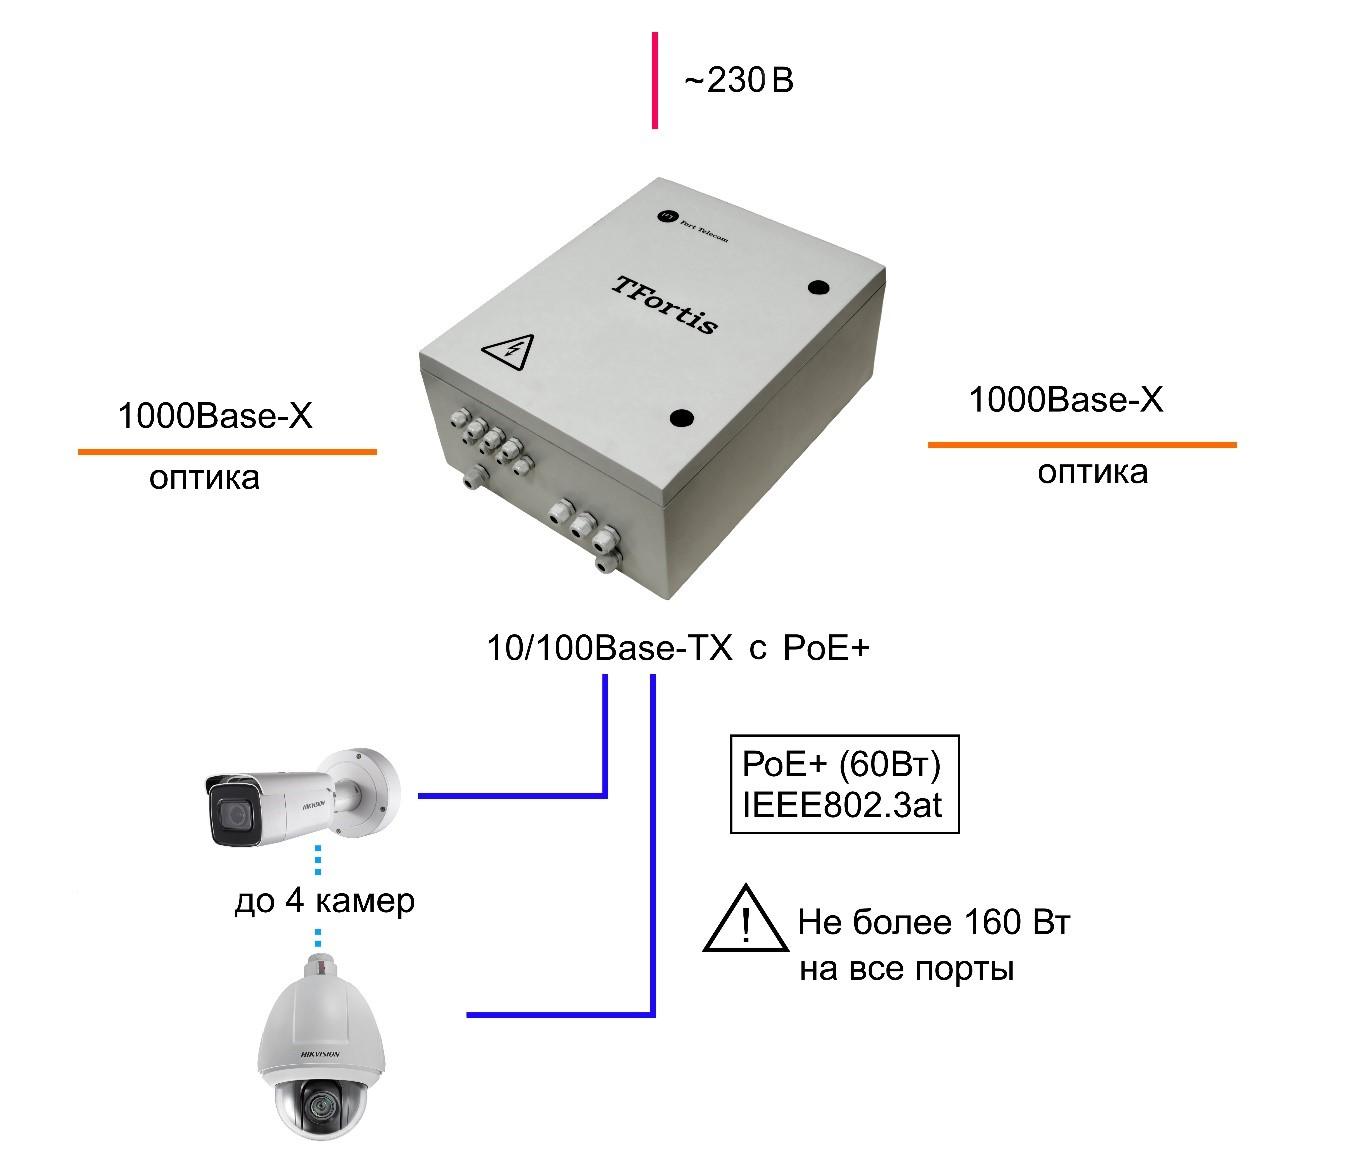 Коммутатор TFortis PSW-2G+UPS-Box - Акрон-СБ